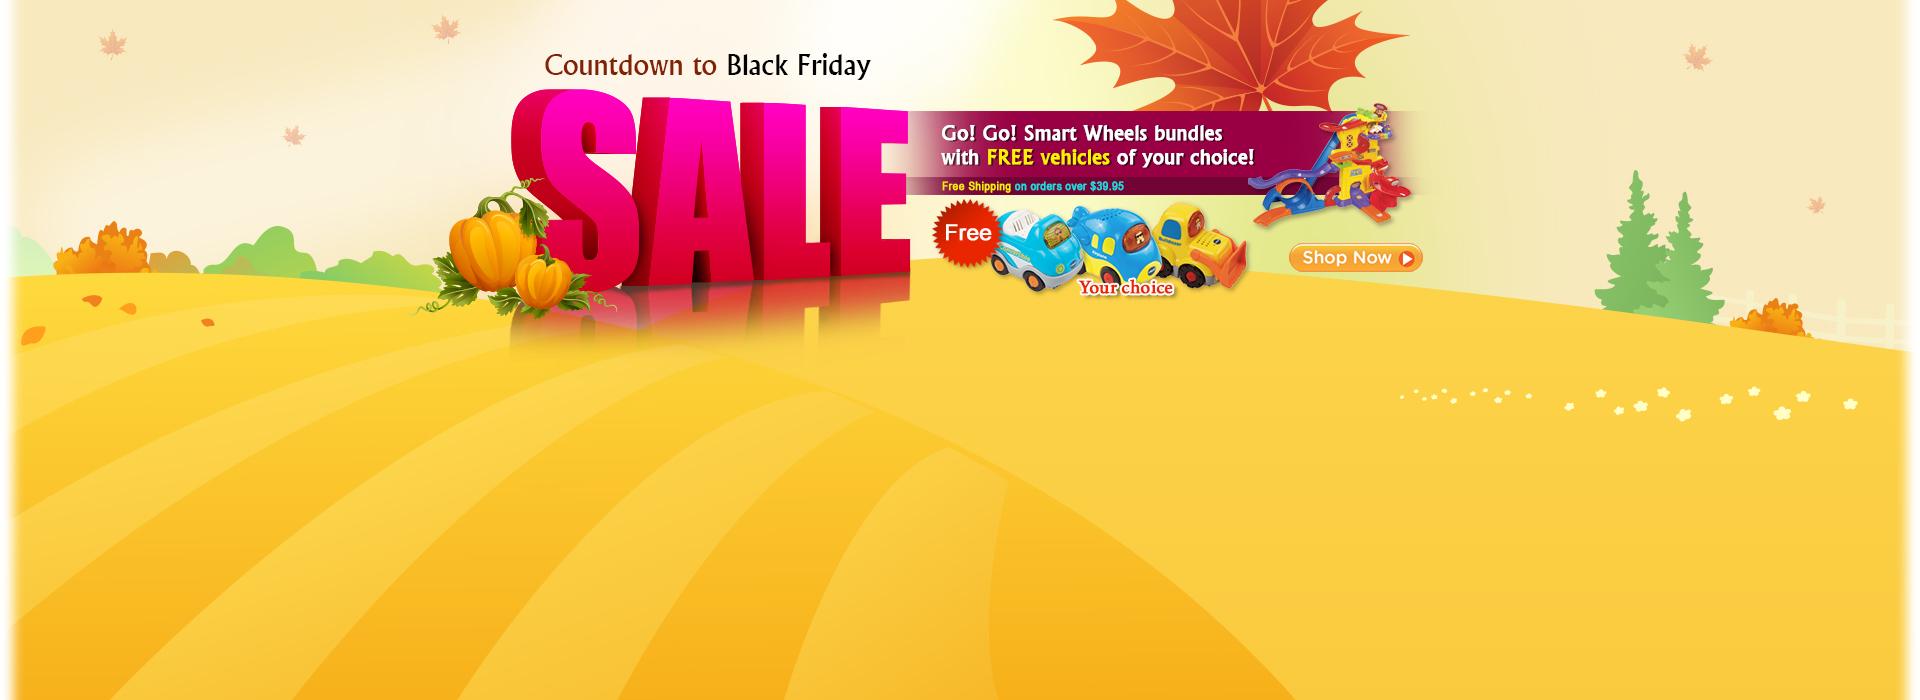 Countdown to Black Friday Sale - Go! Go! Smart Wheels Deals